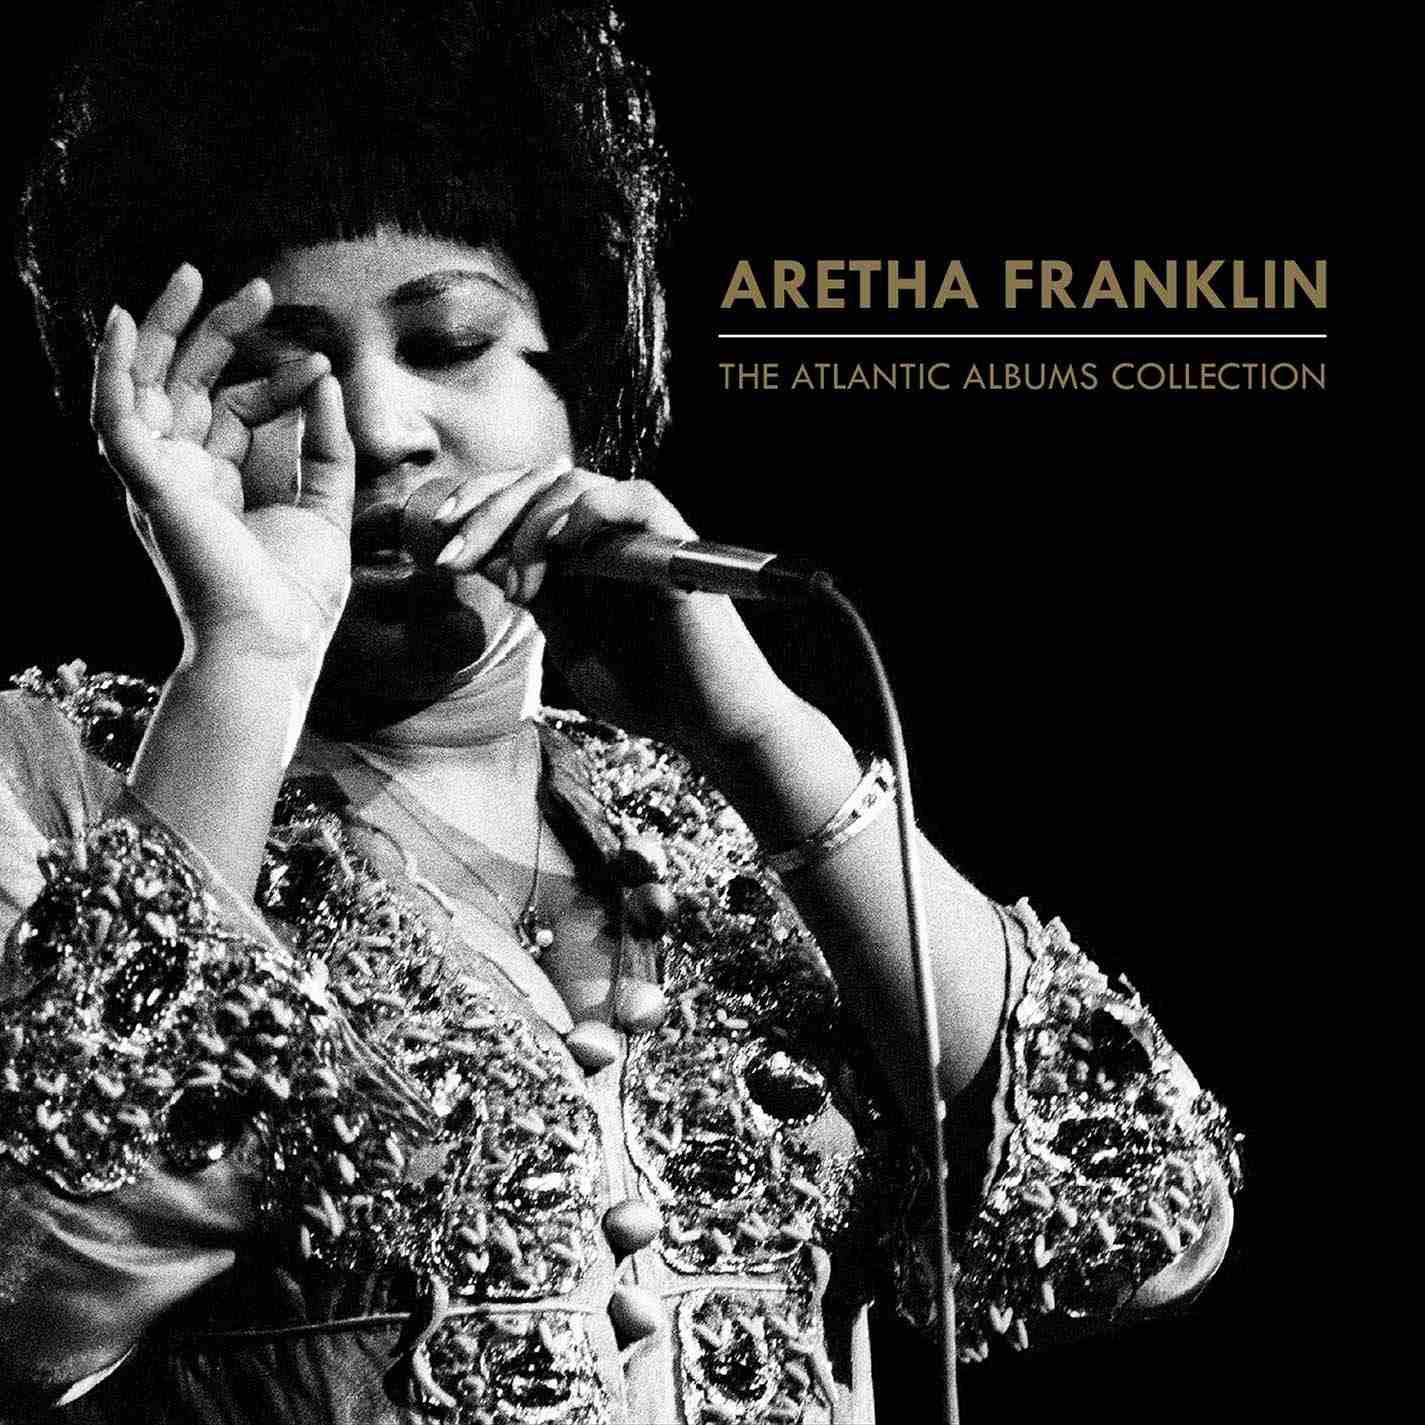 Aretha Franklin album art.